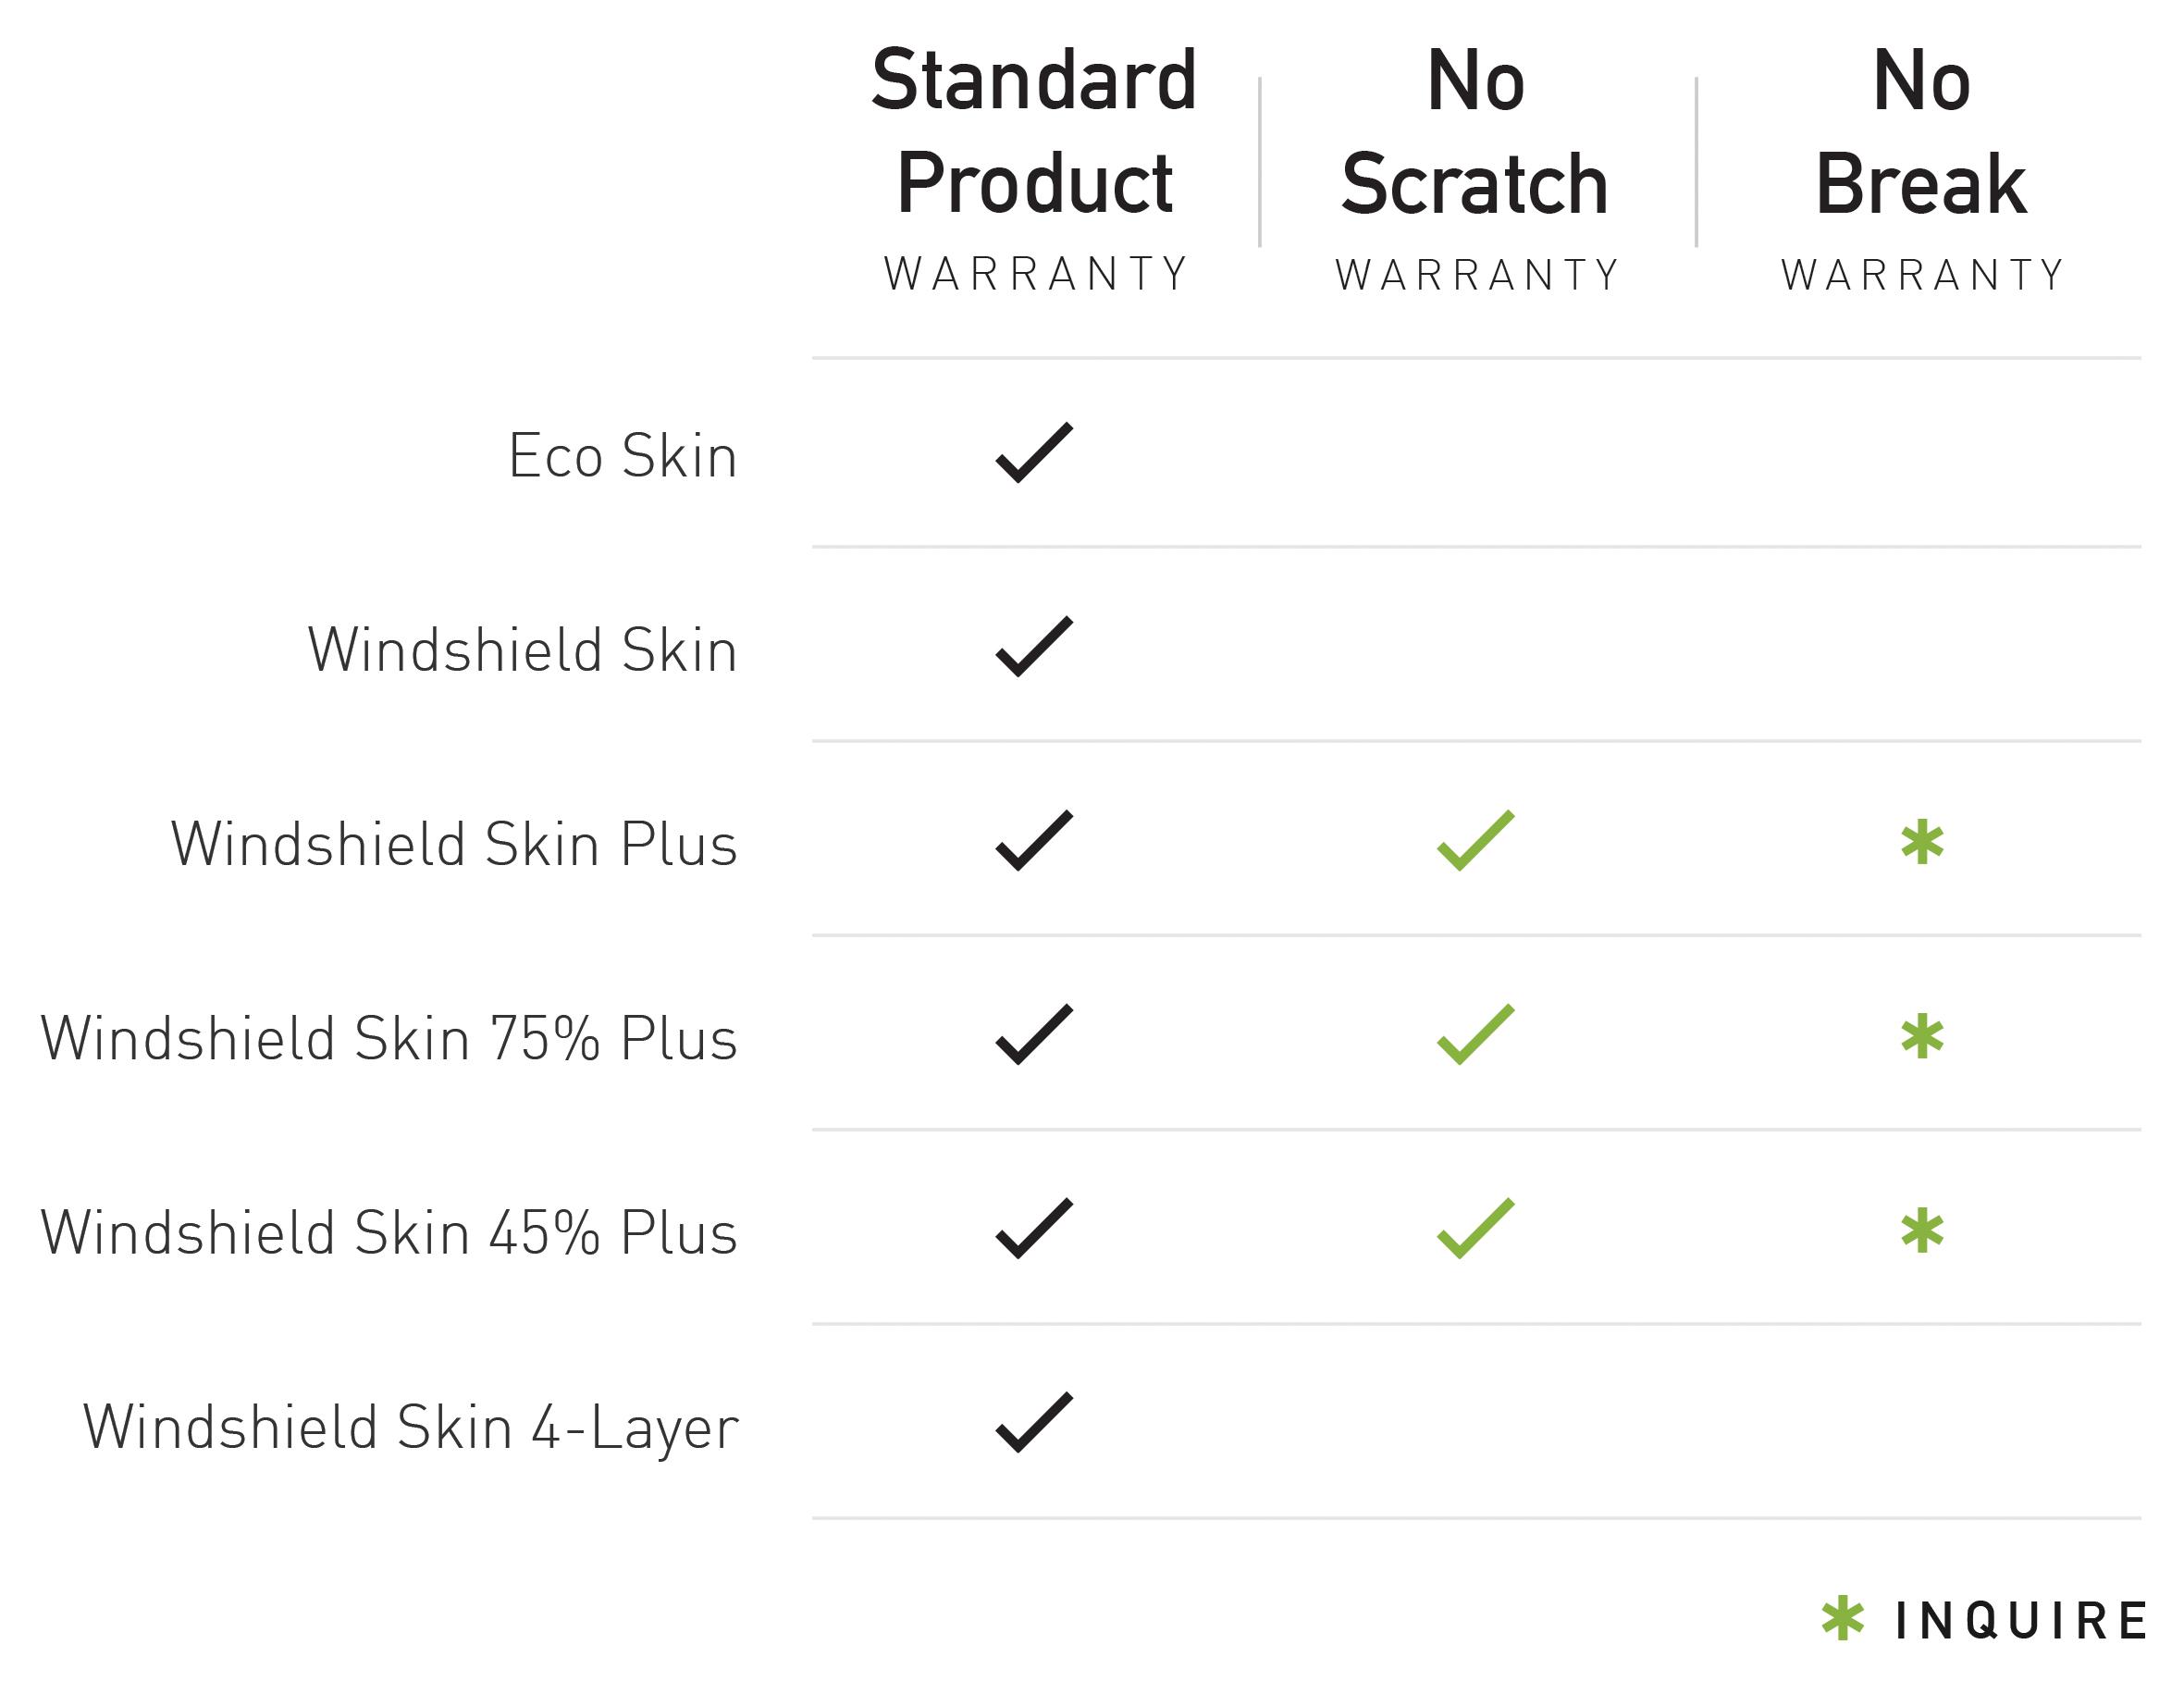 Bray - Chart - Product Line Warranty-5.jpg